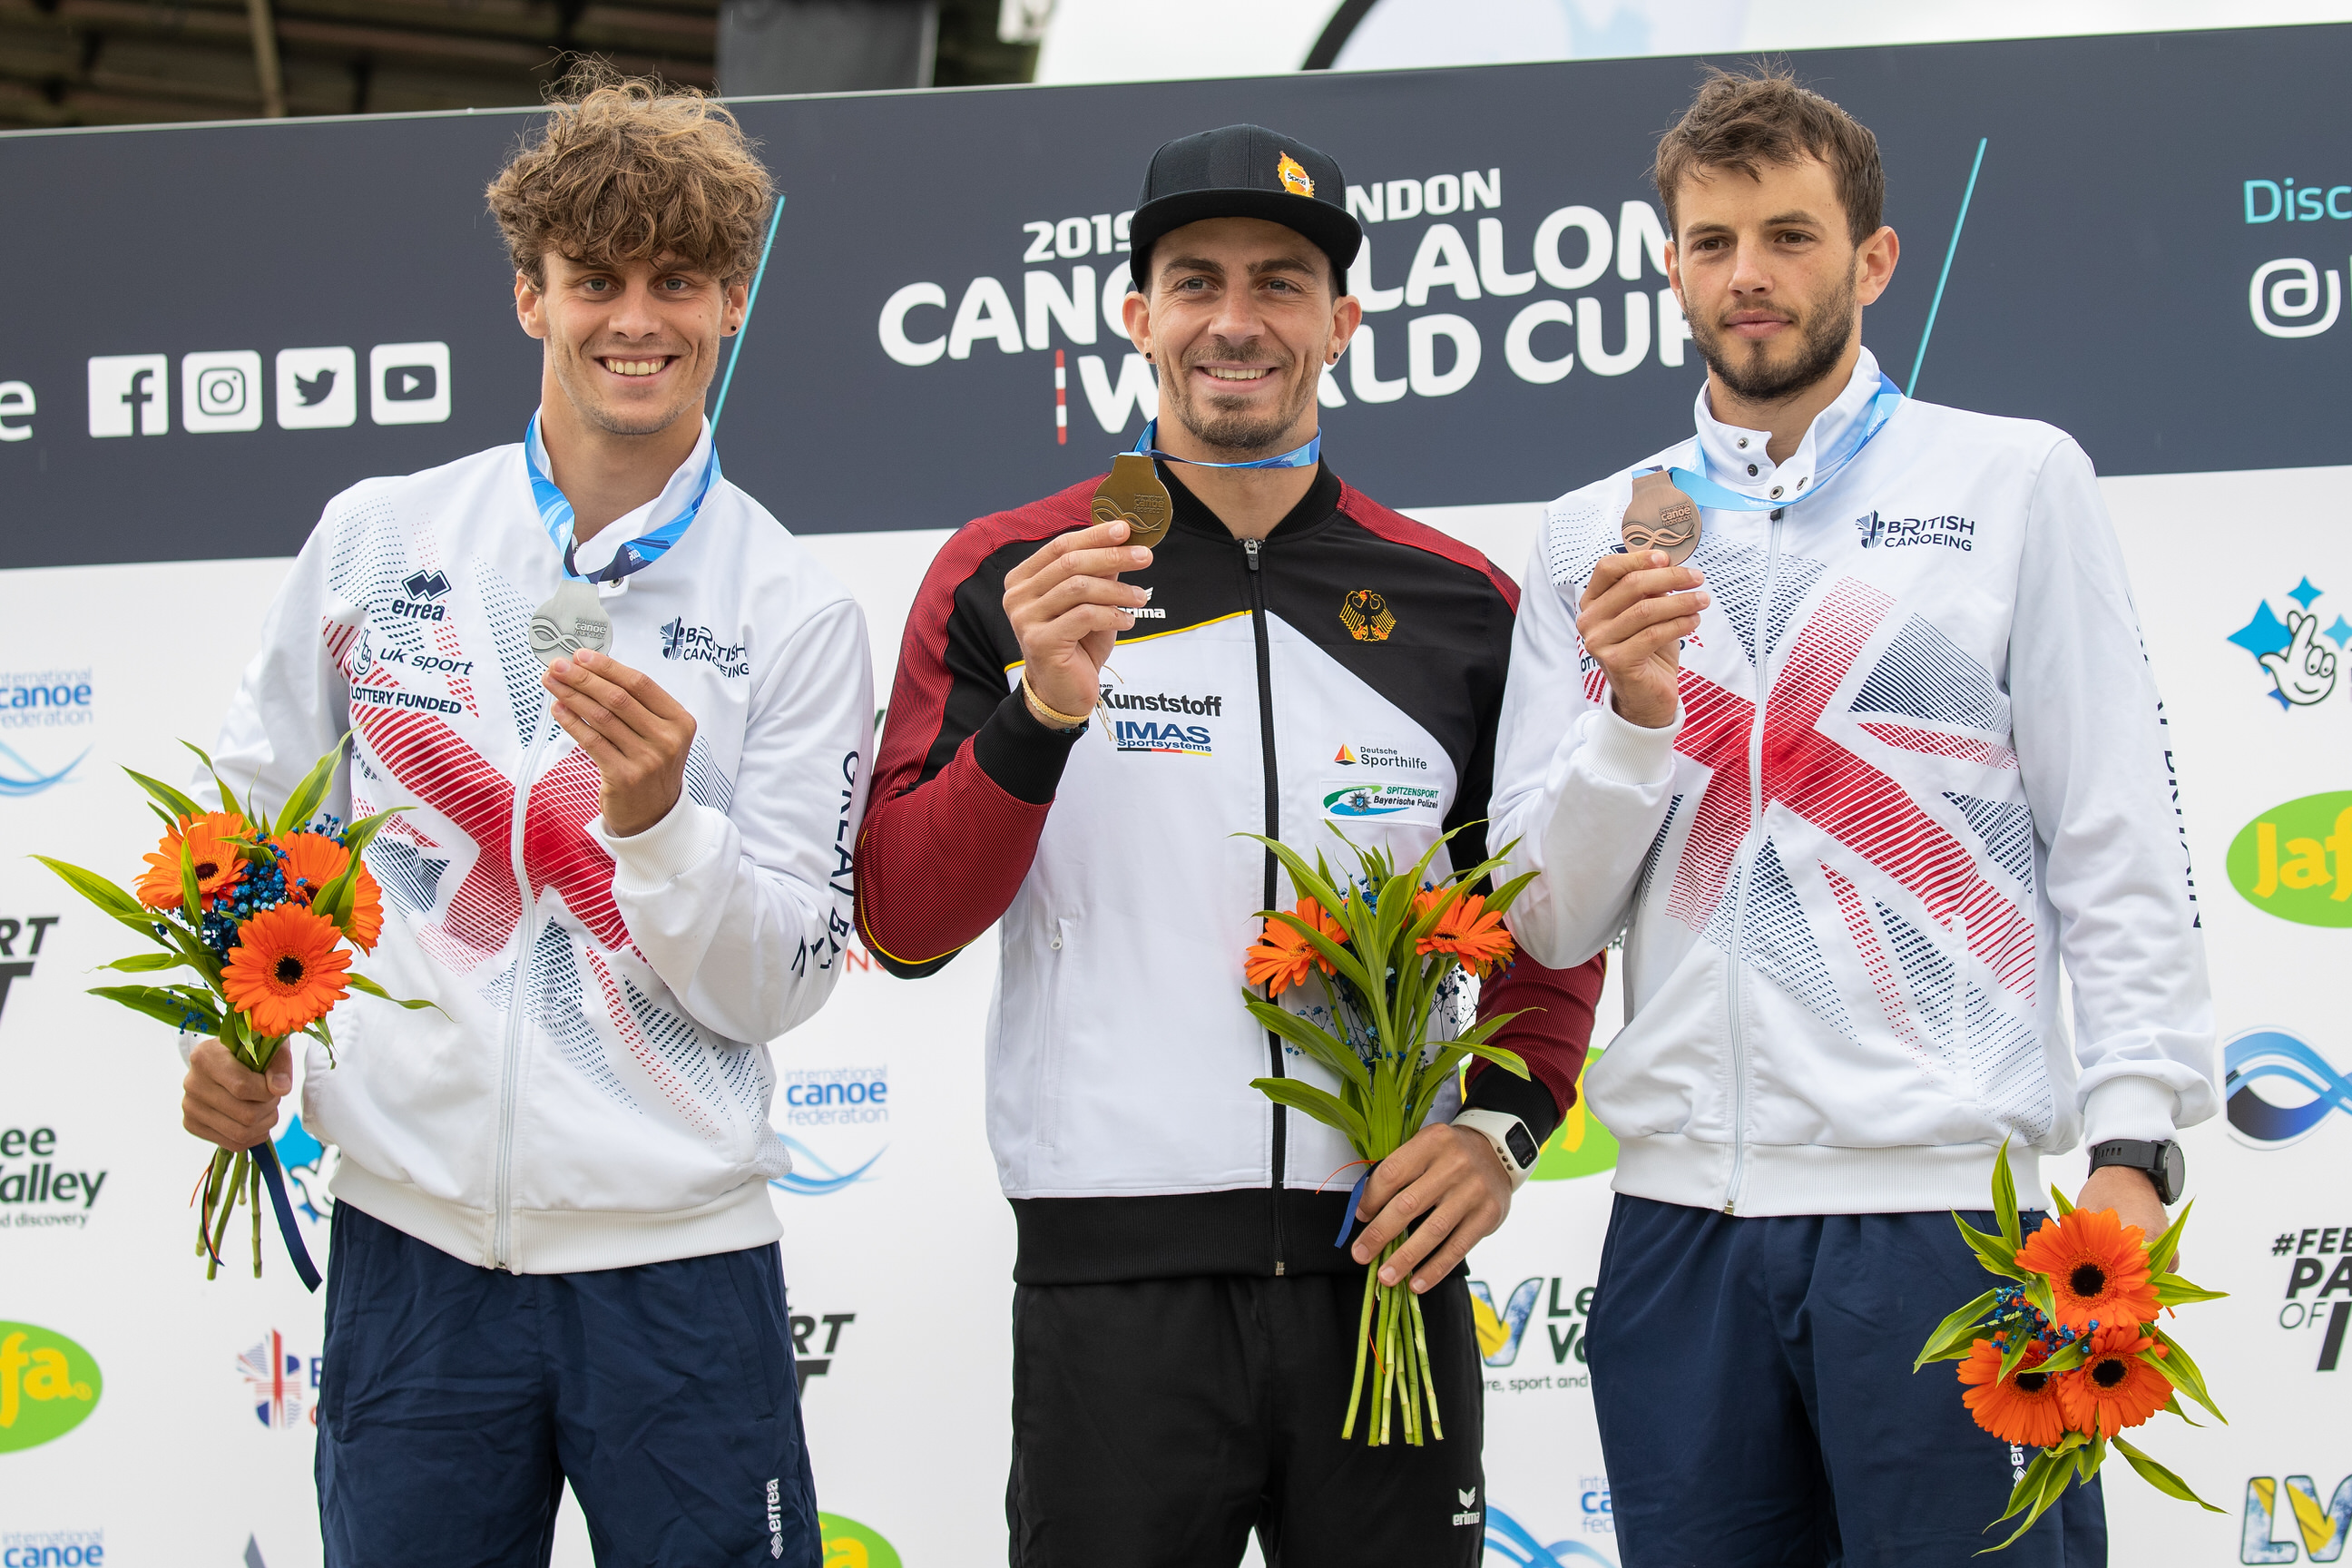 London Canoe Slalom World Cup